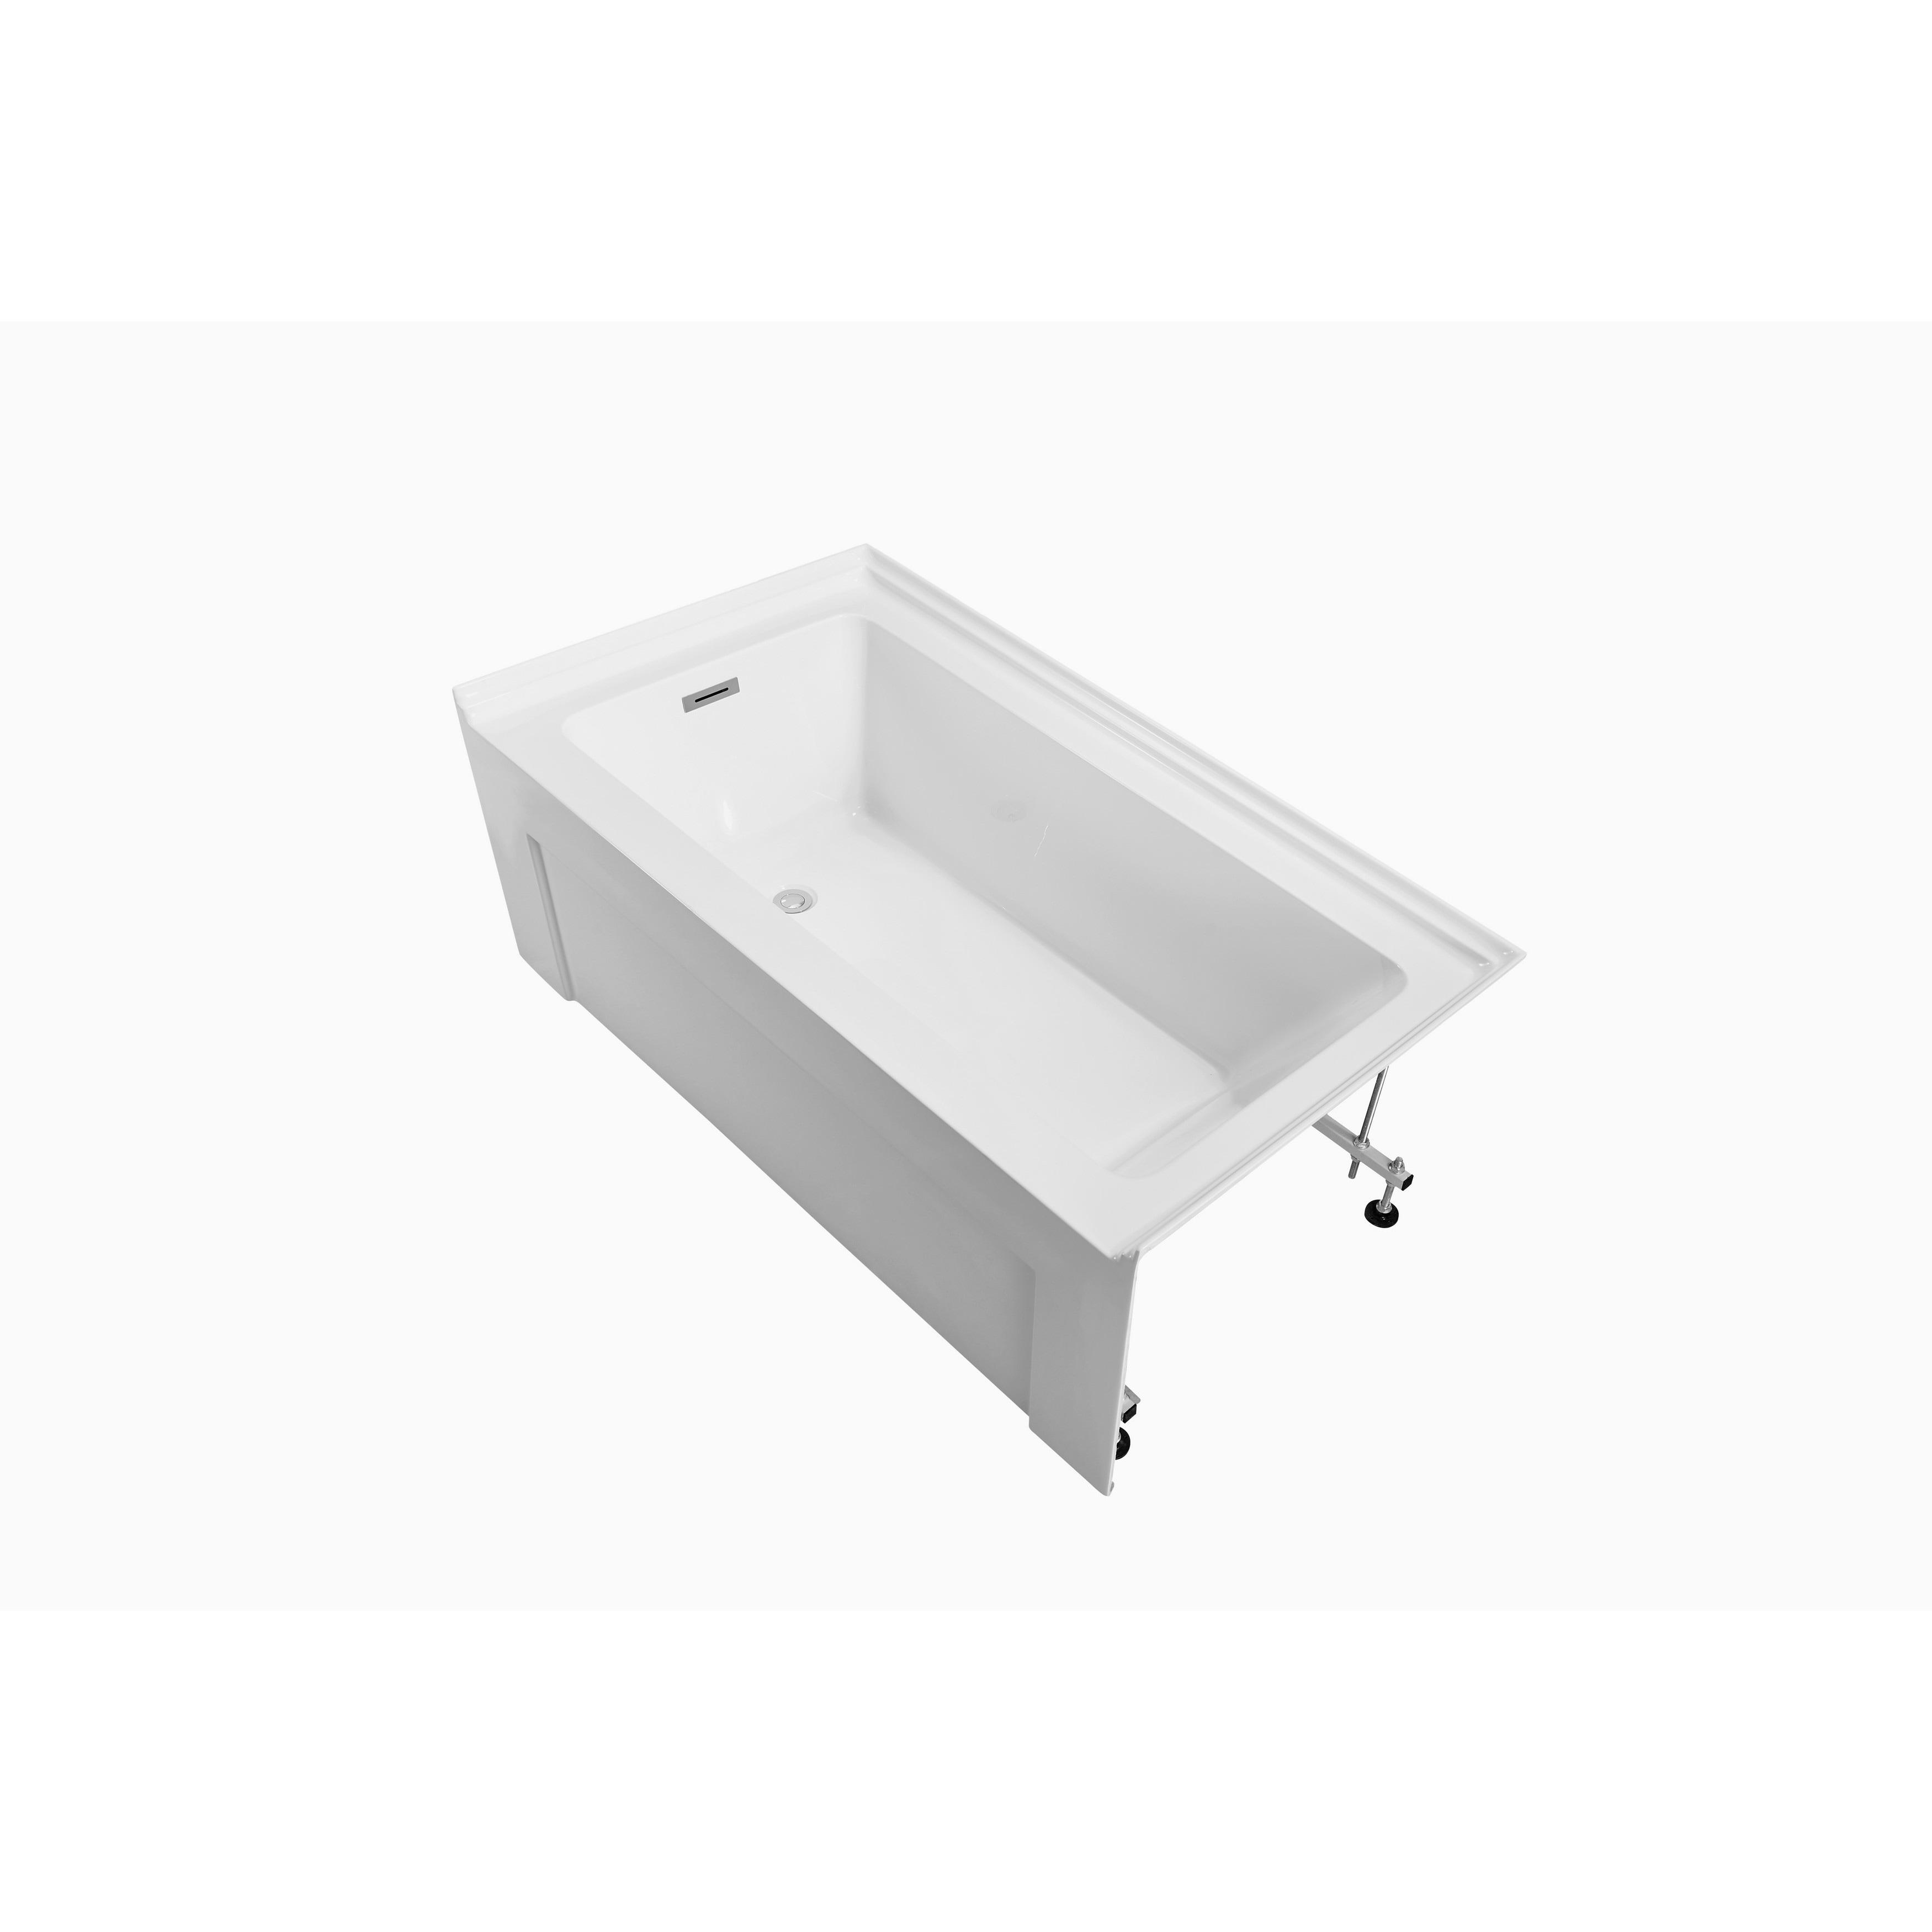 villager bathroom plug en bathtub shower tub removal ideas shield freestanding and ariosa maax collection drain kohler charming